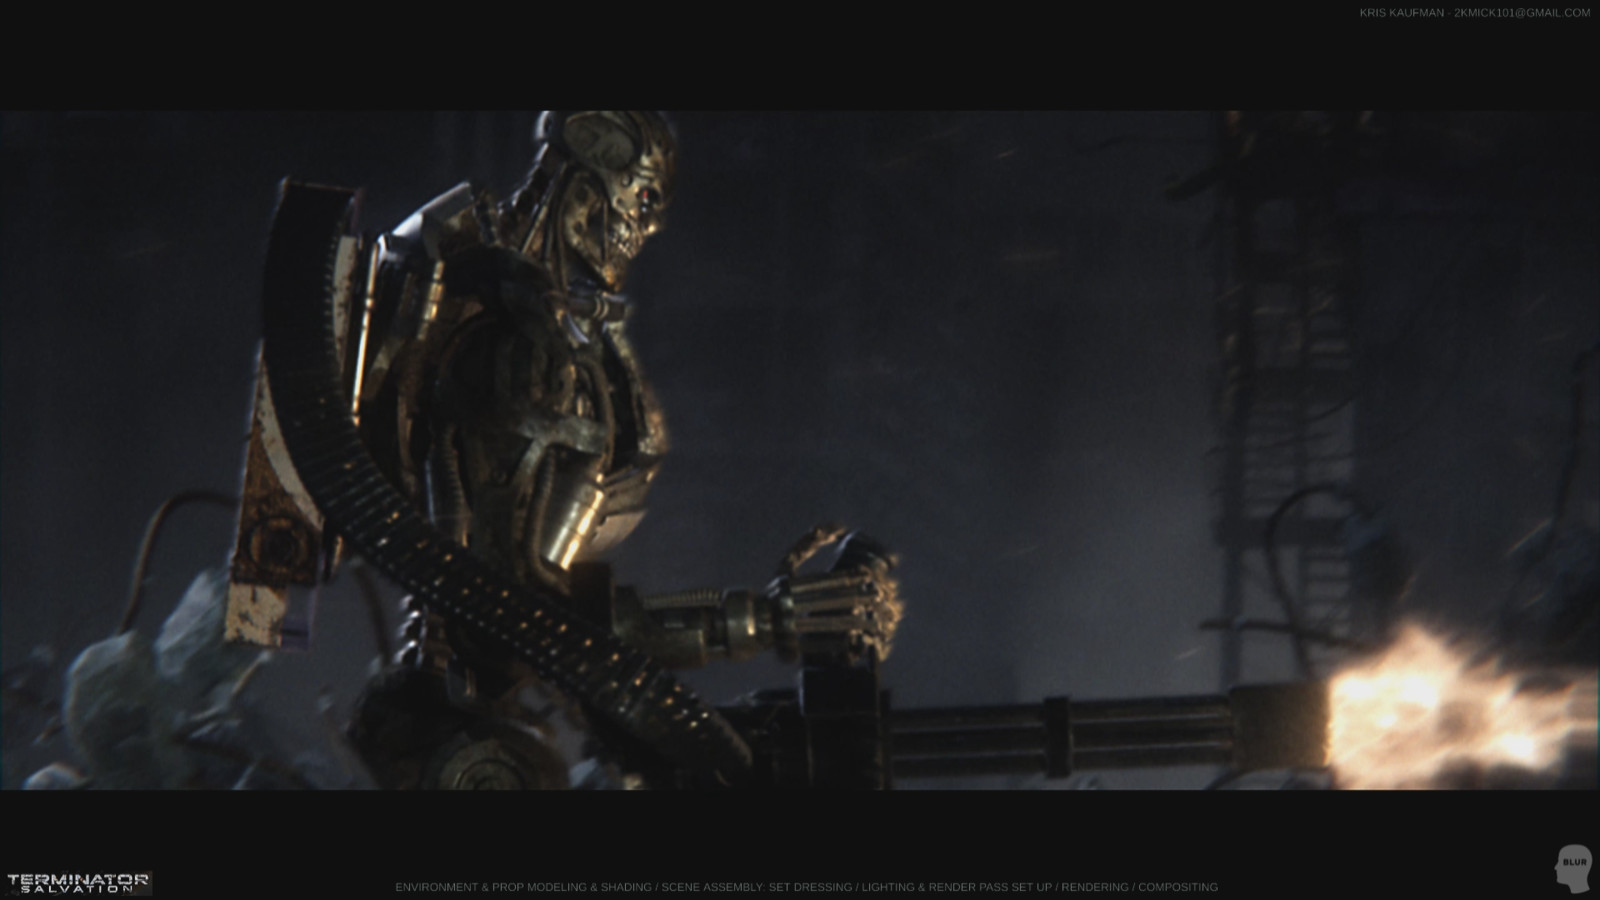 Terminator Salvation: Environment Modeling & Shading / Lighting / Rendering / Compositing